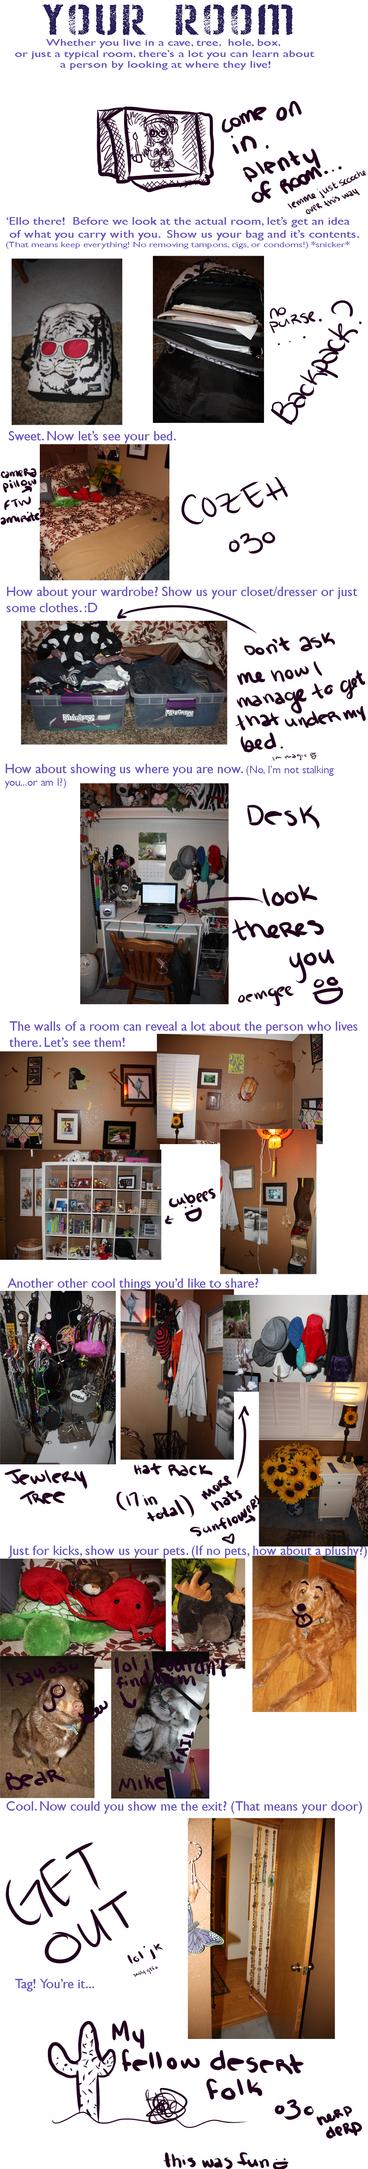 My room meme by falling-featherz